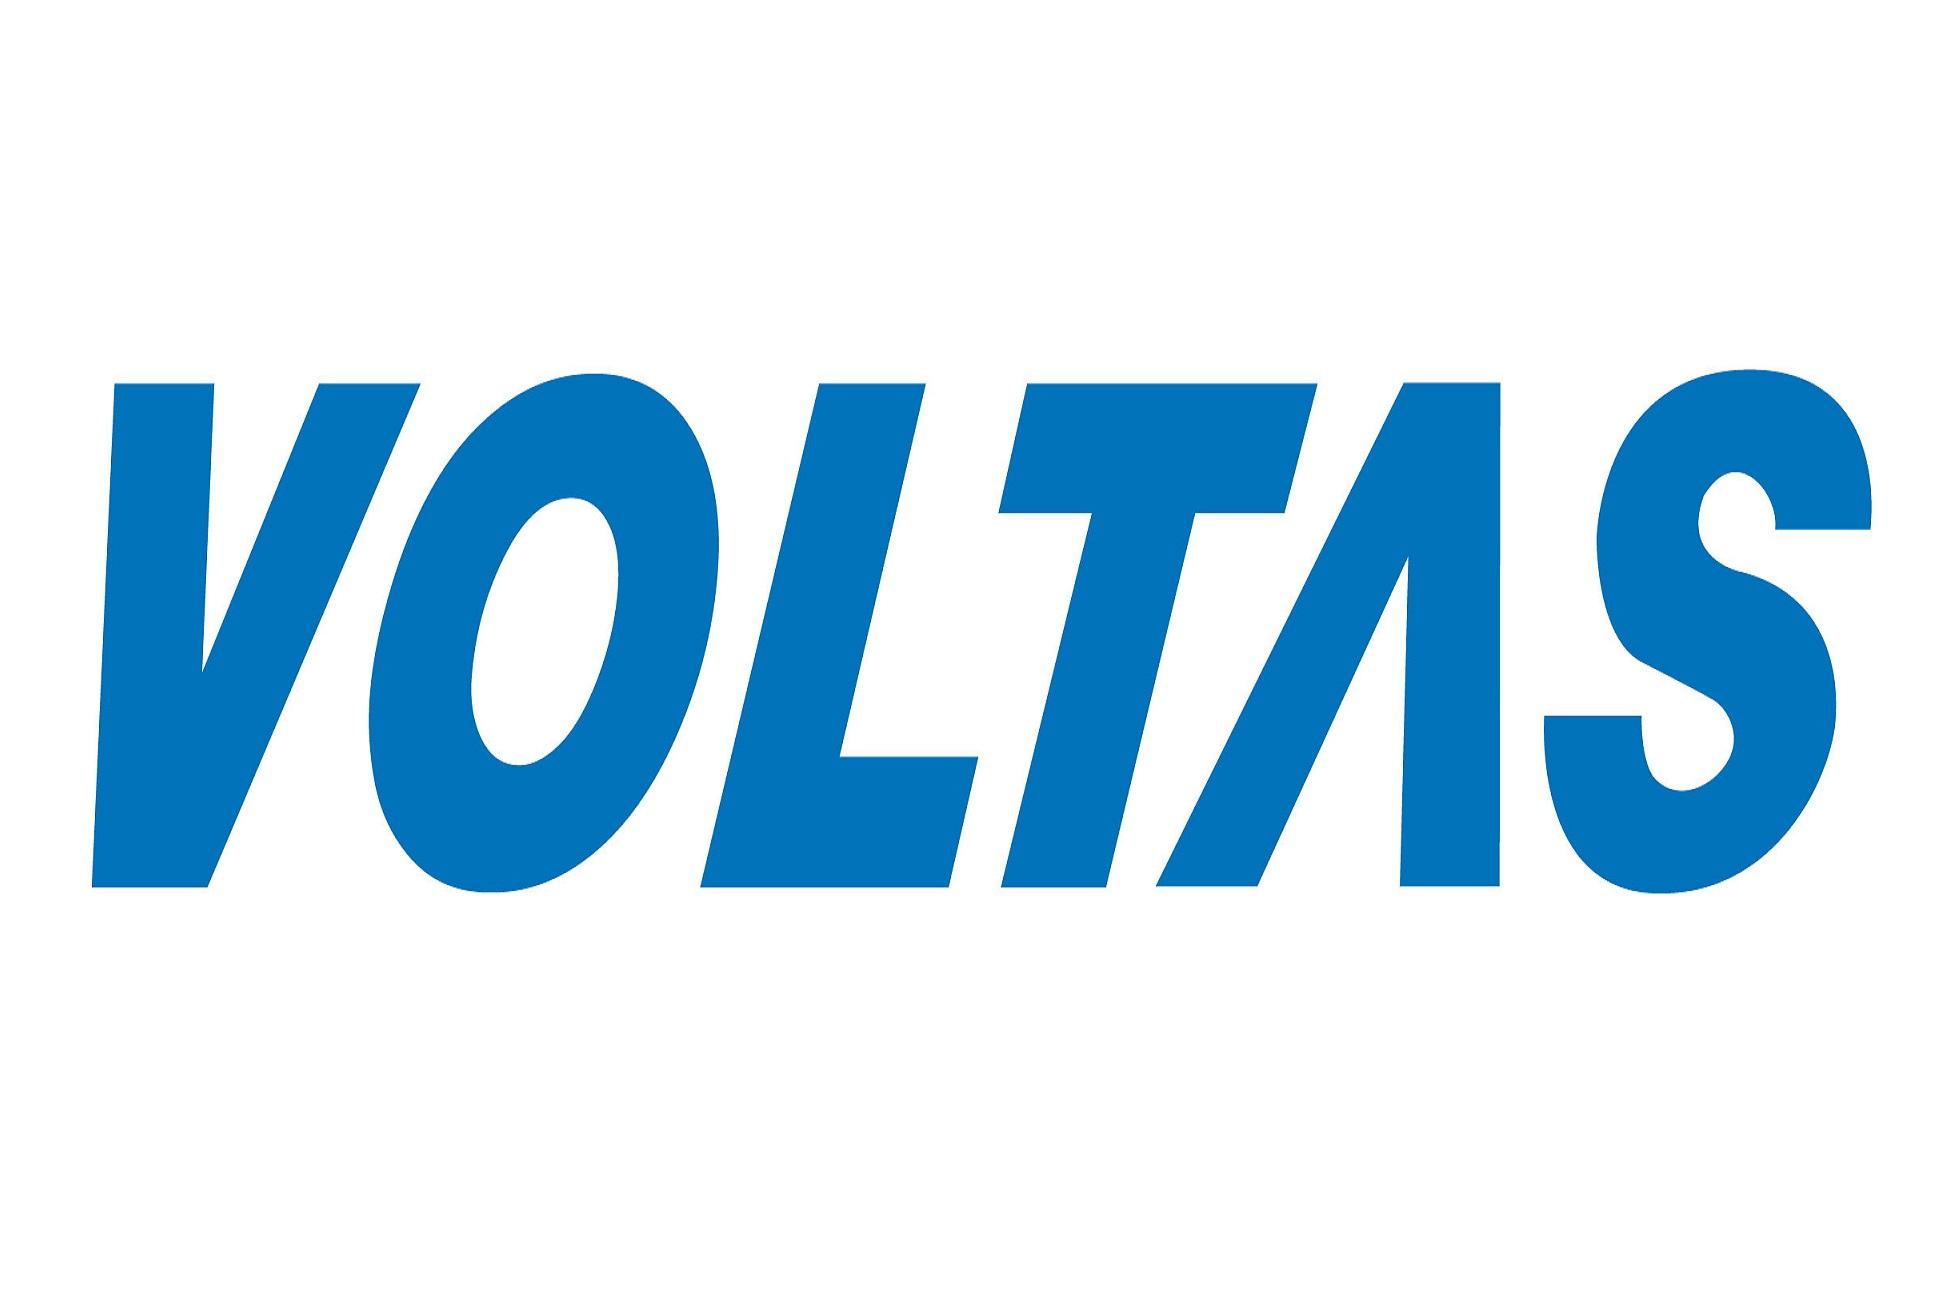 Voltas 183PX-R 1.5 Ton 3 Star Split AC Image